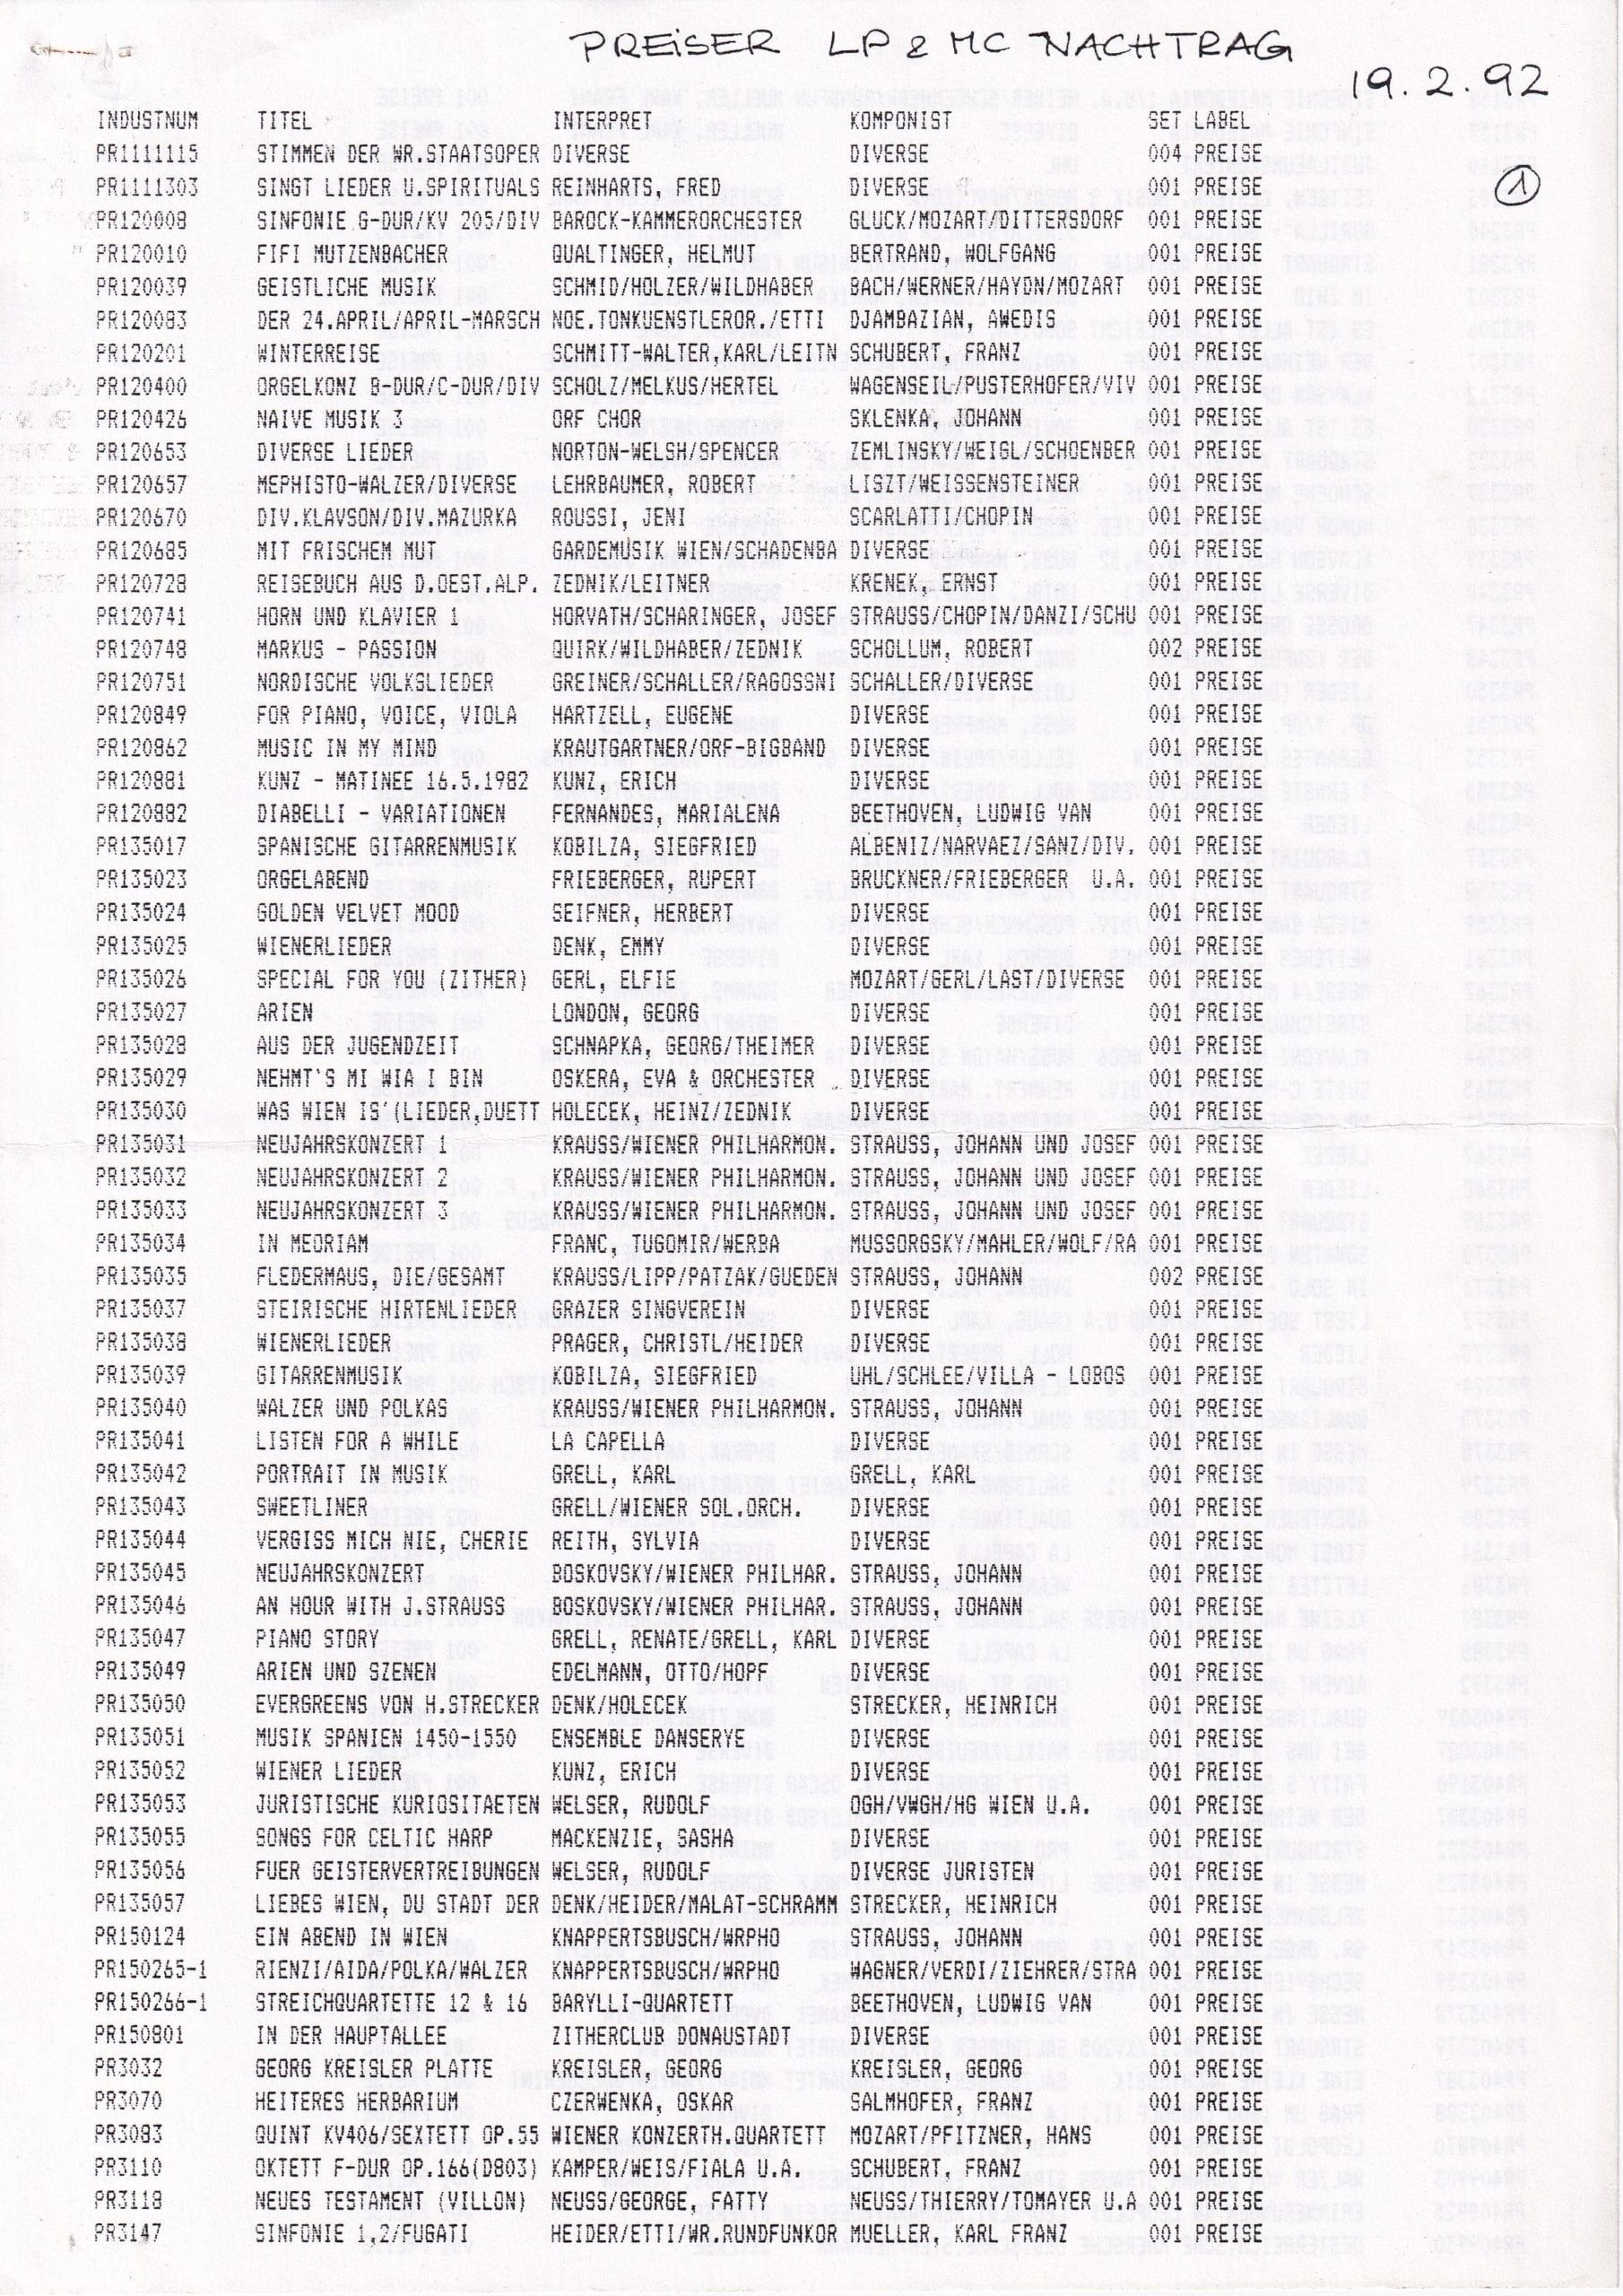 LP & MC Nachtrag 1992 – 1